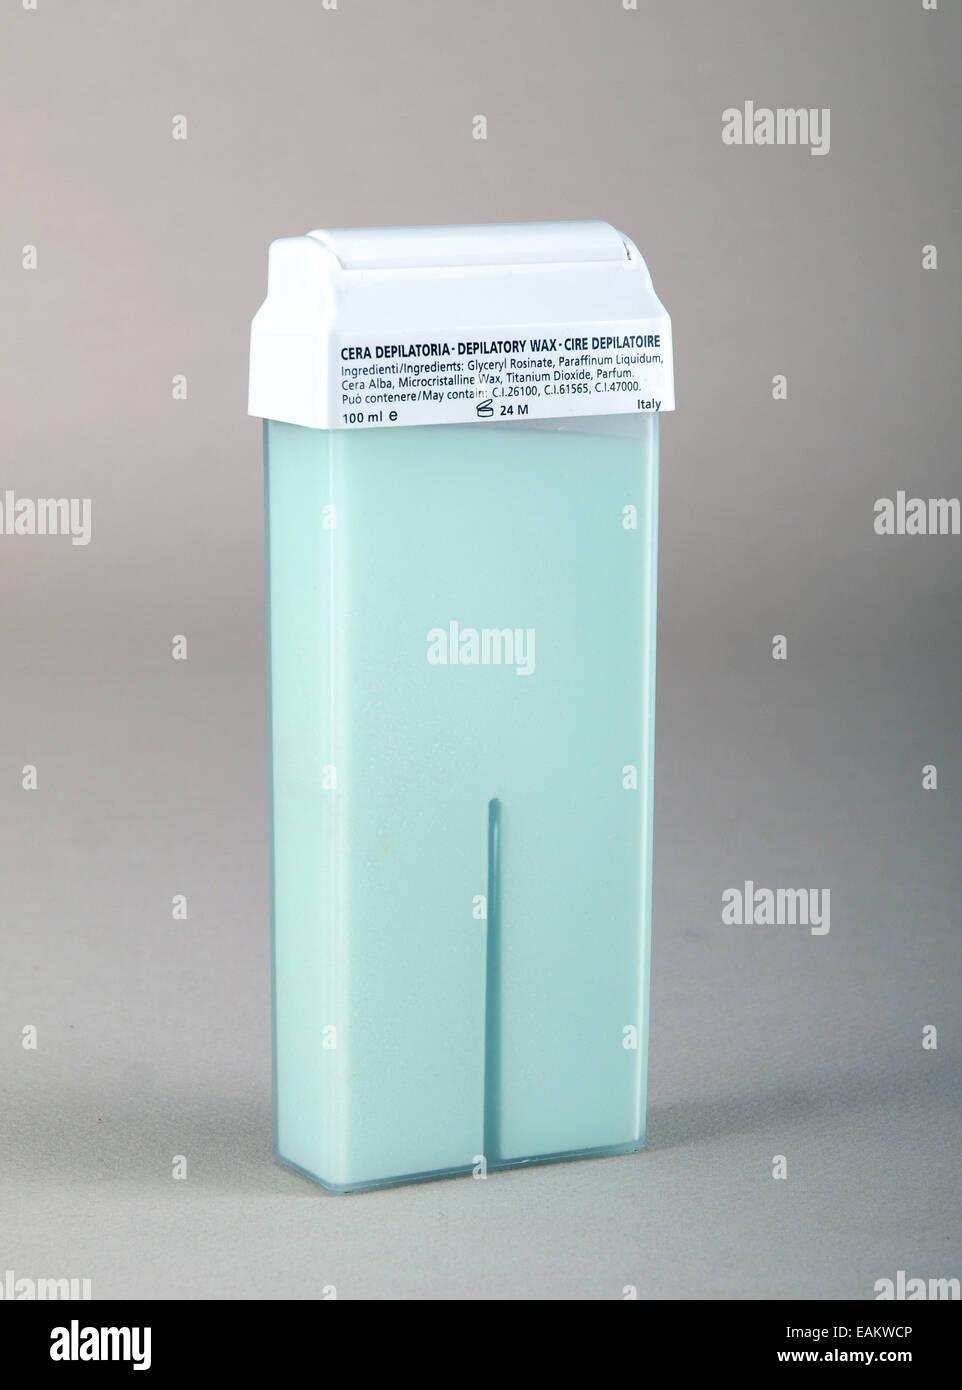 Depilatory wax - Stock Image